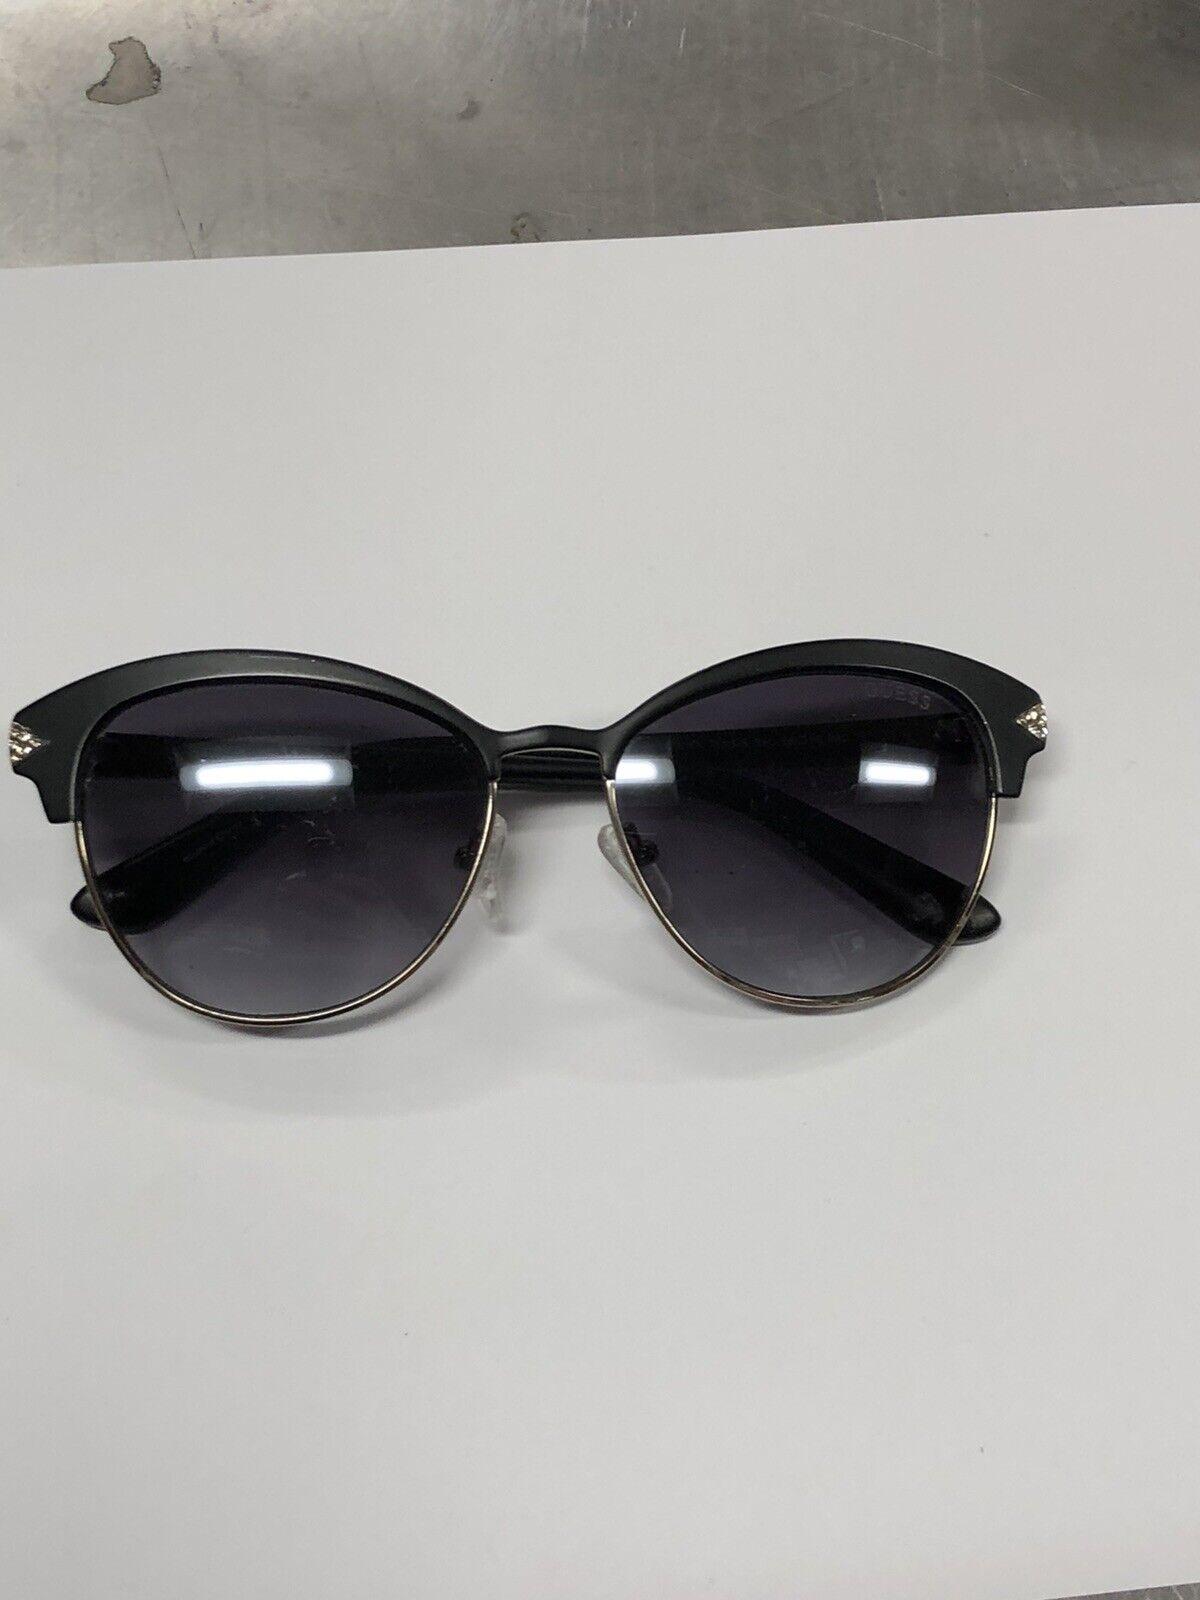 GUESS GU 7515-S 05C Cat Eye Lens Style Black